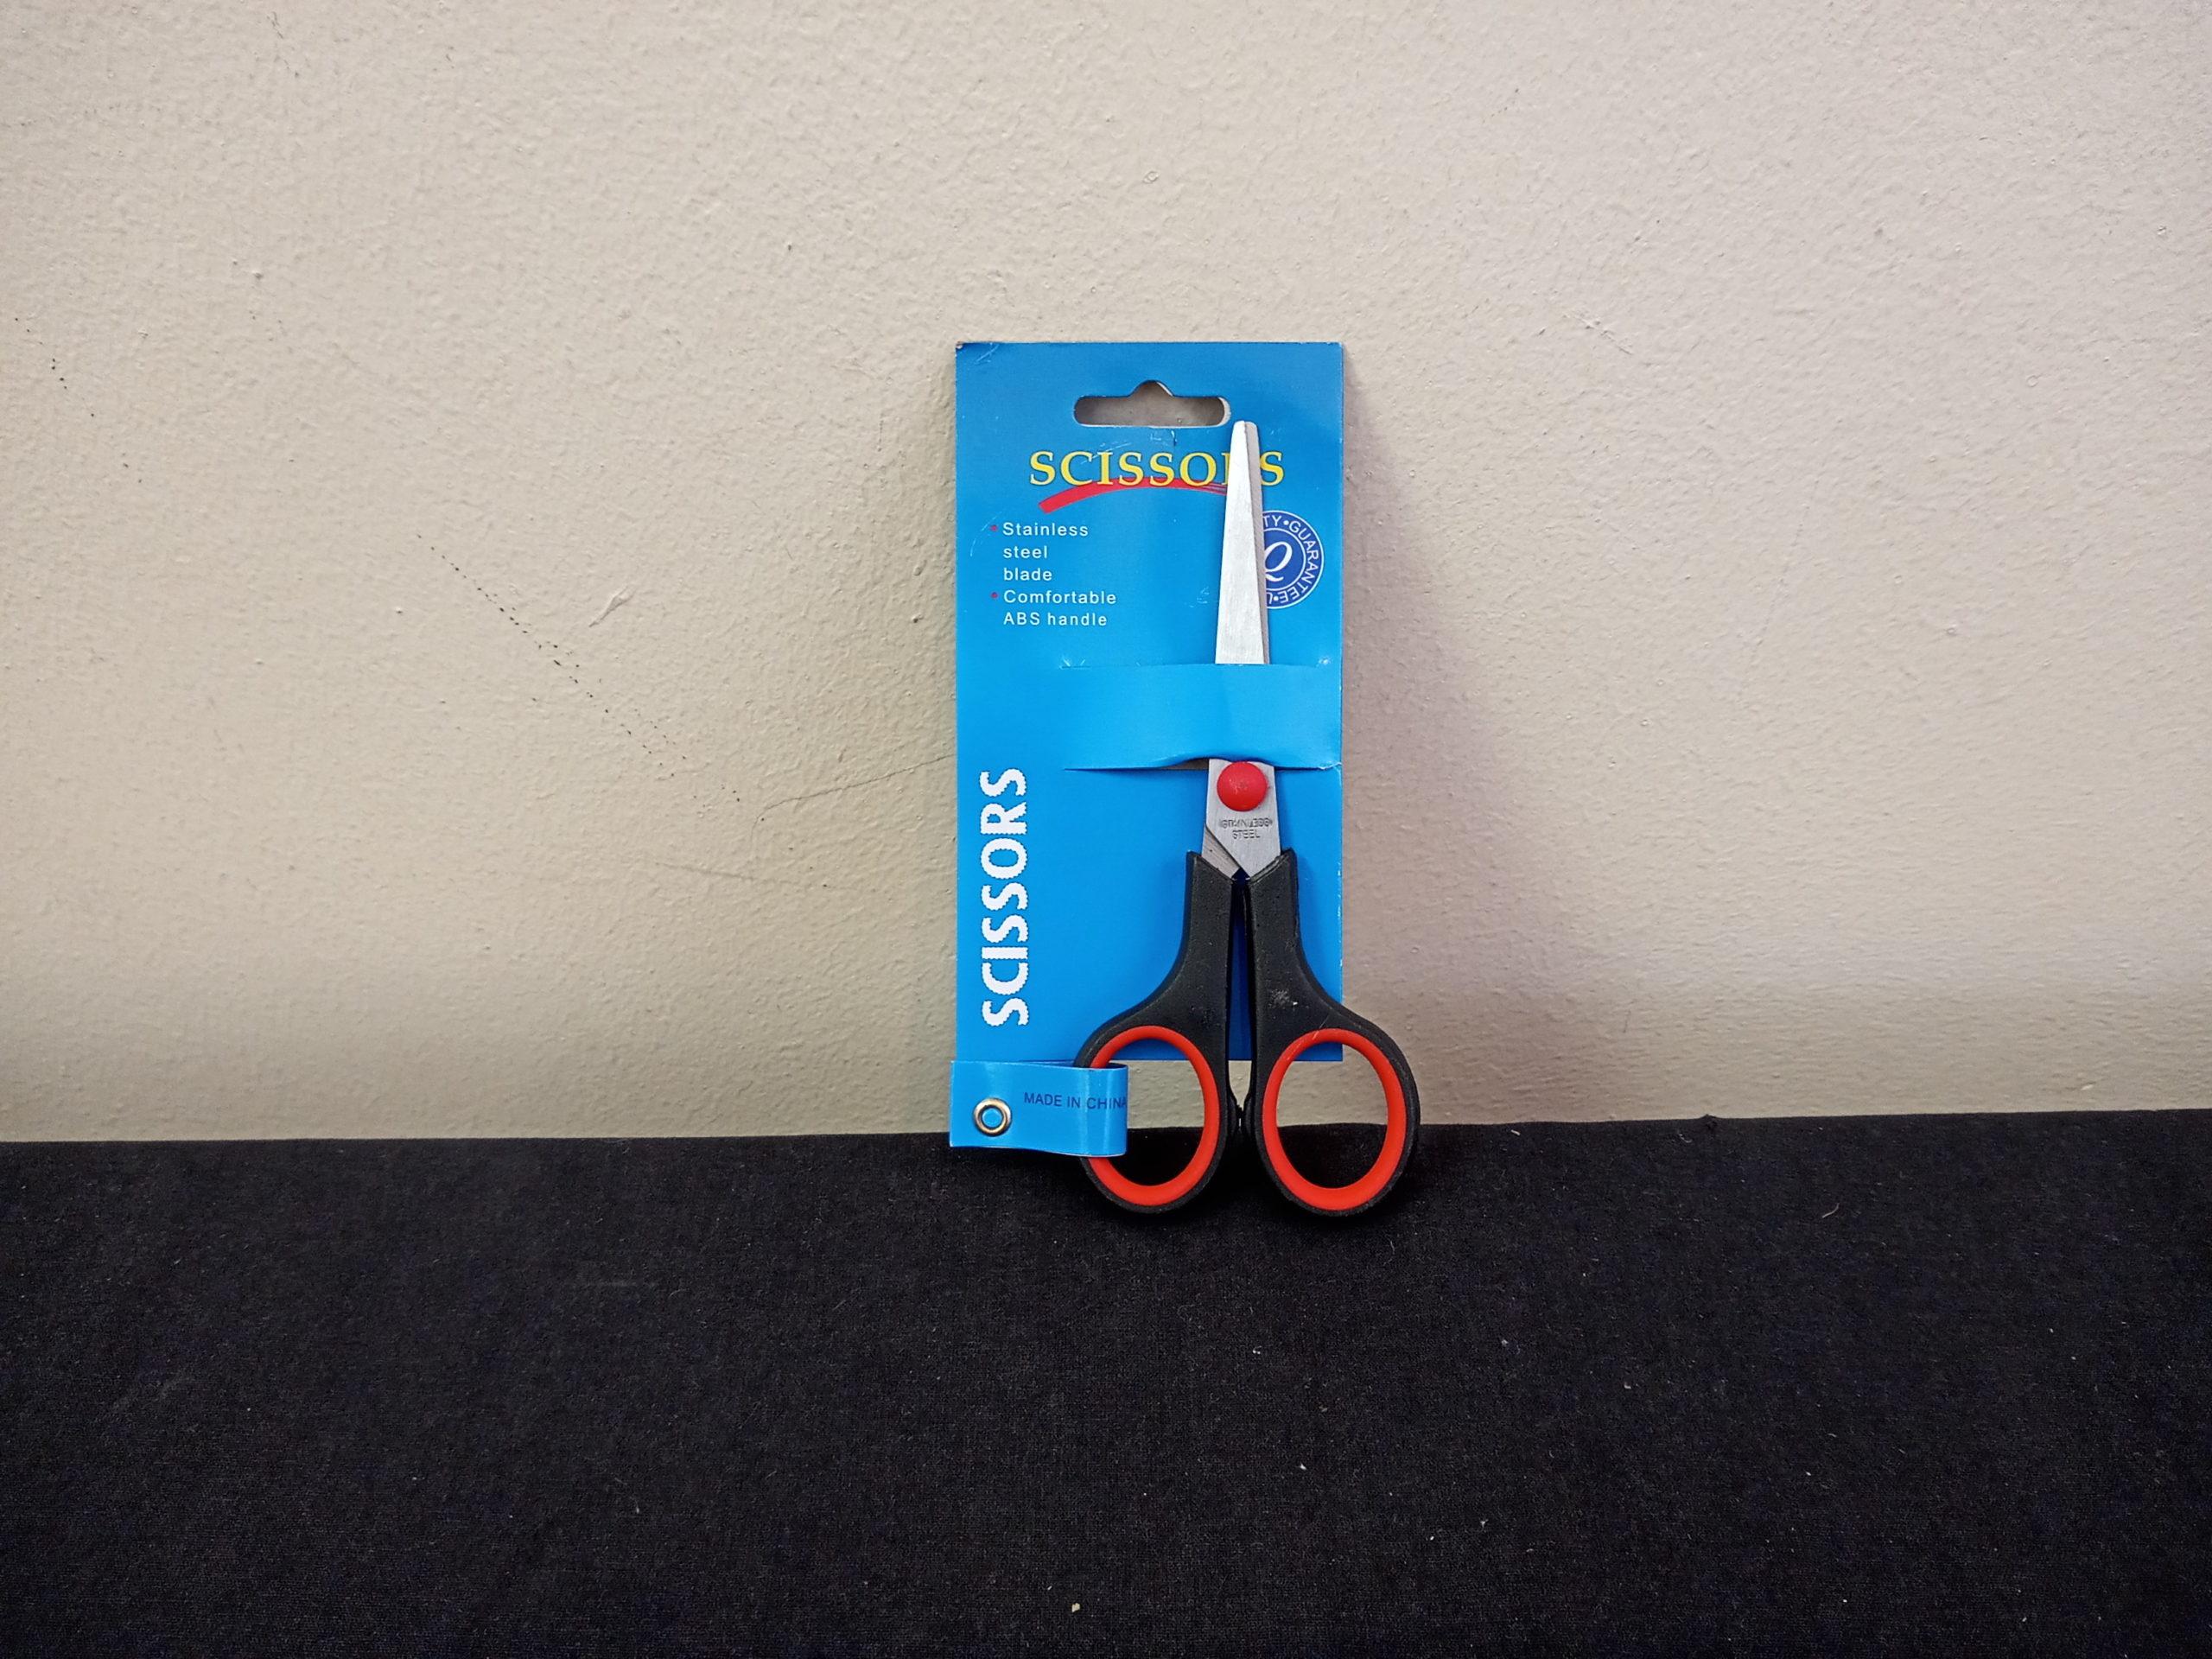 Scissors from Mercury Wholesalers